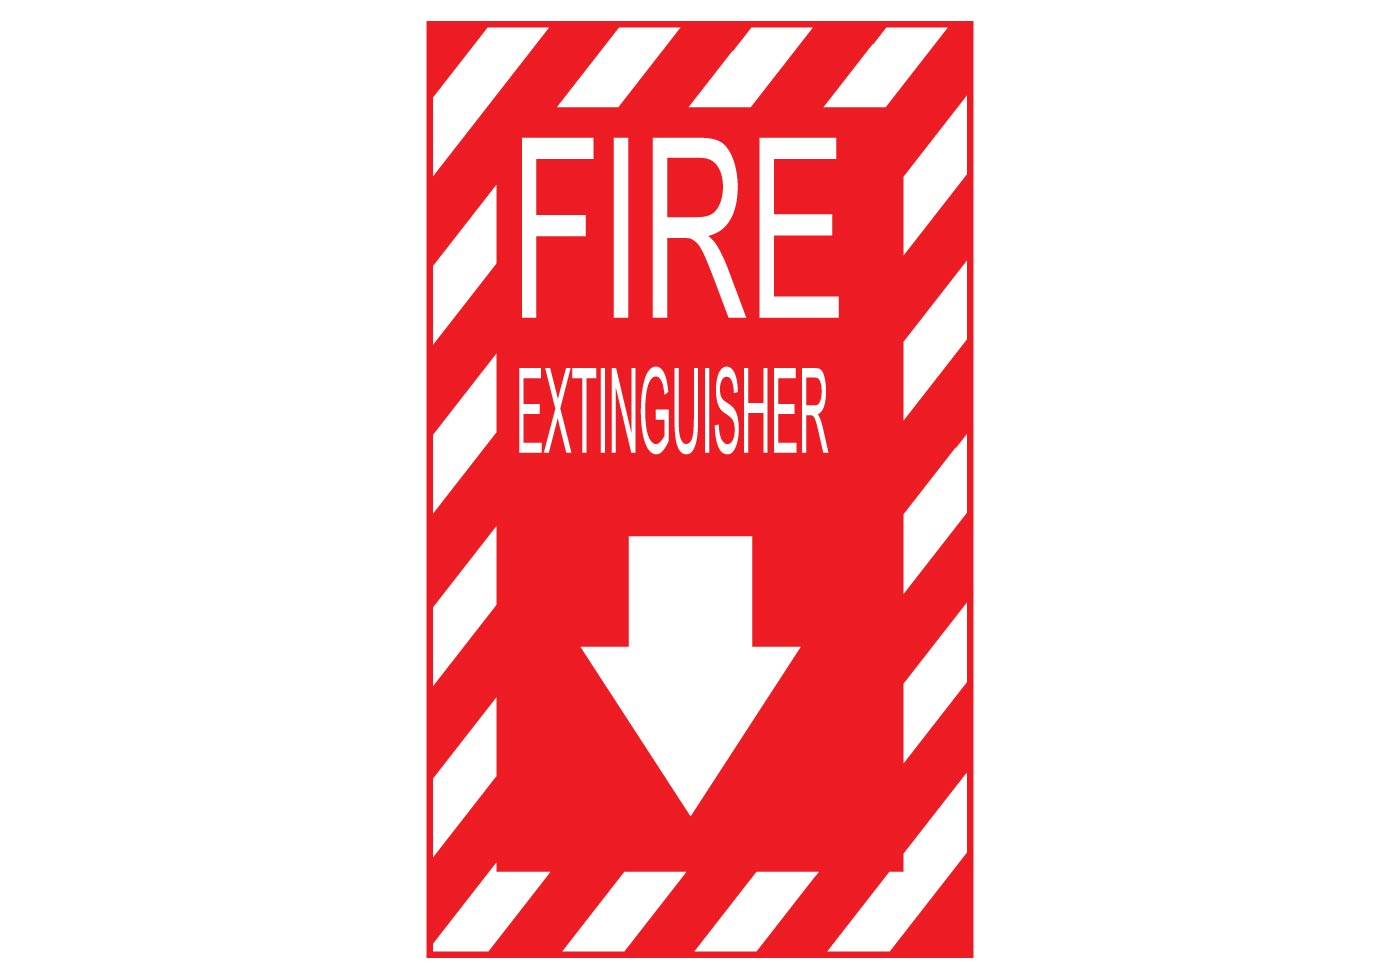 fire extinguisher sign vector free vector art at vecteezy